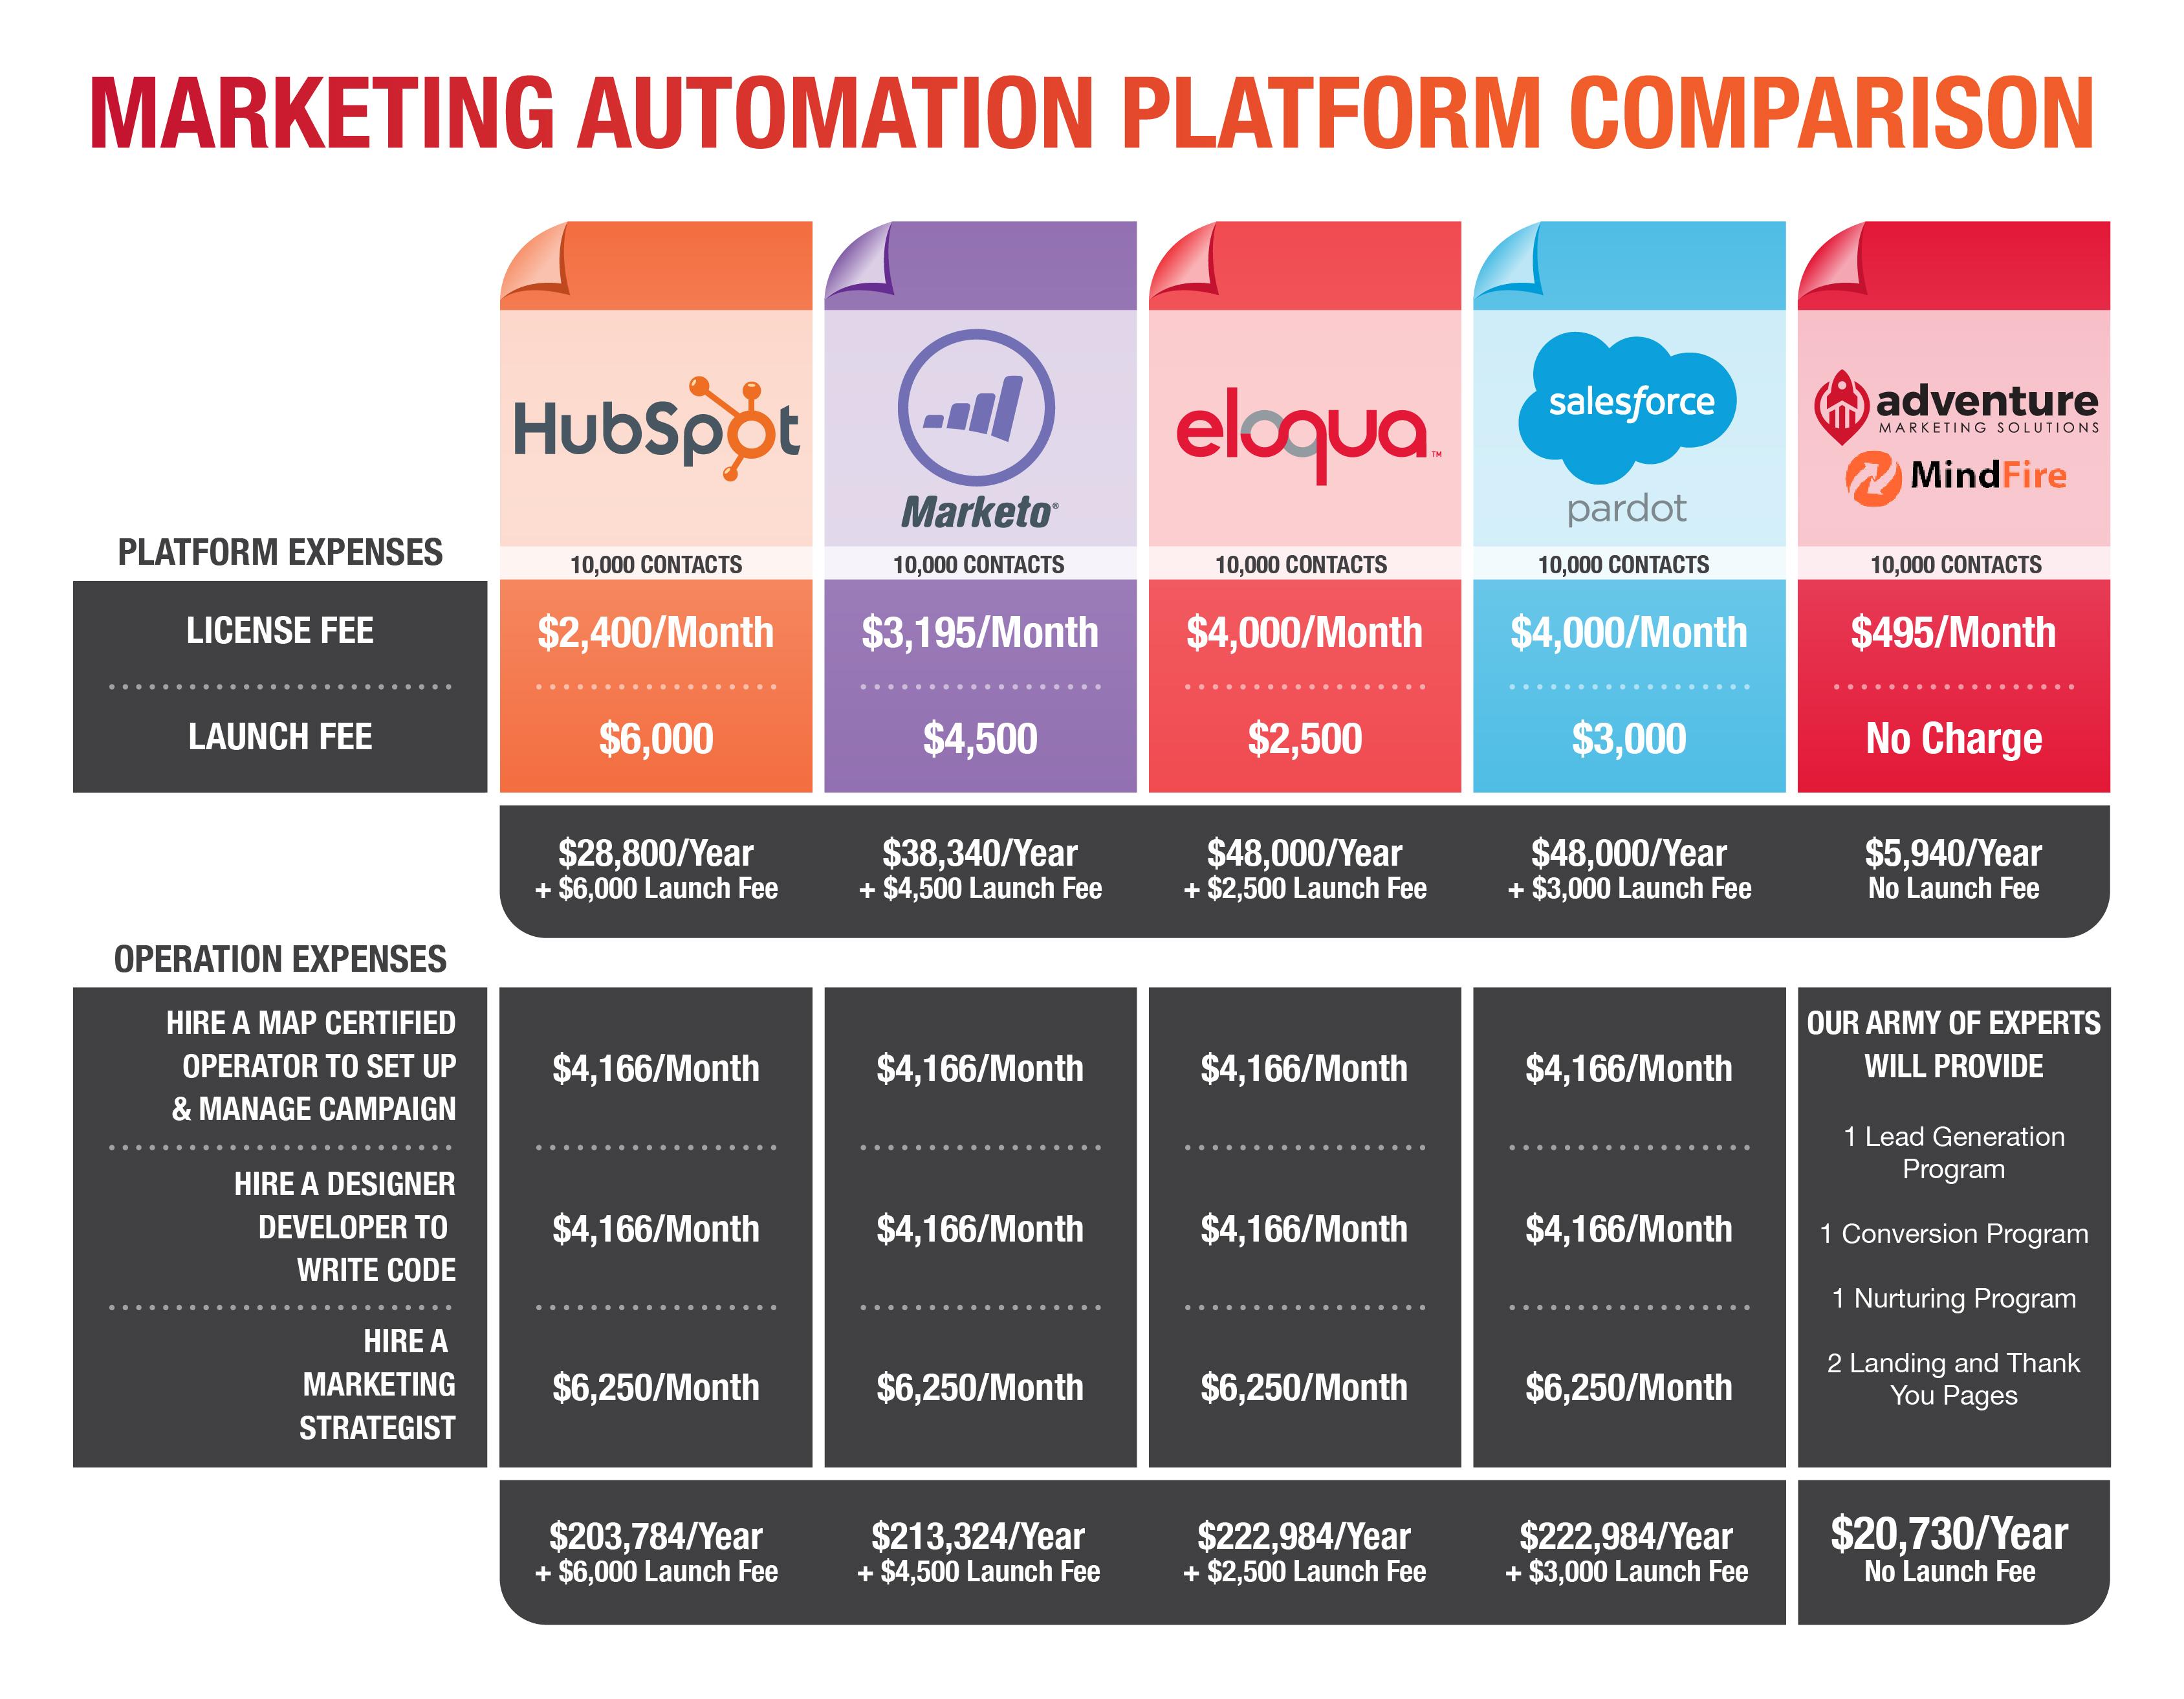 A Comparison of Marketing Automation Platforms (MAPs)